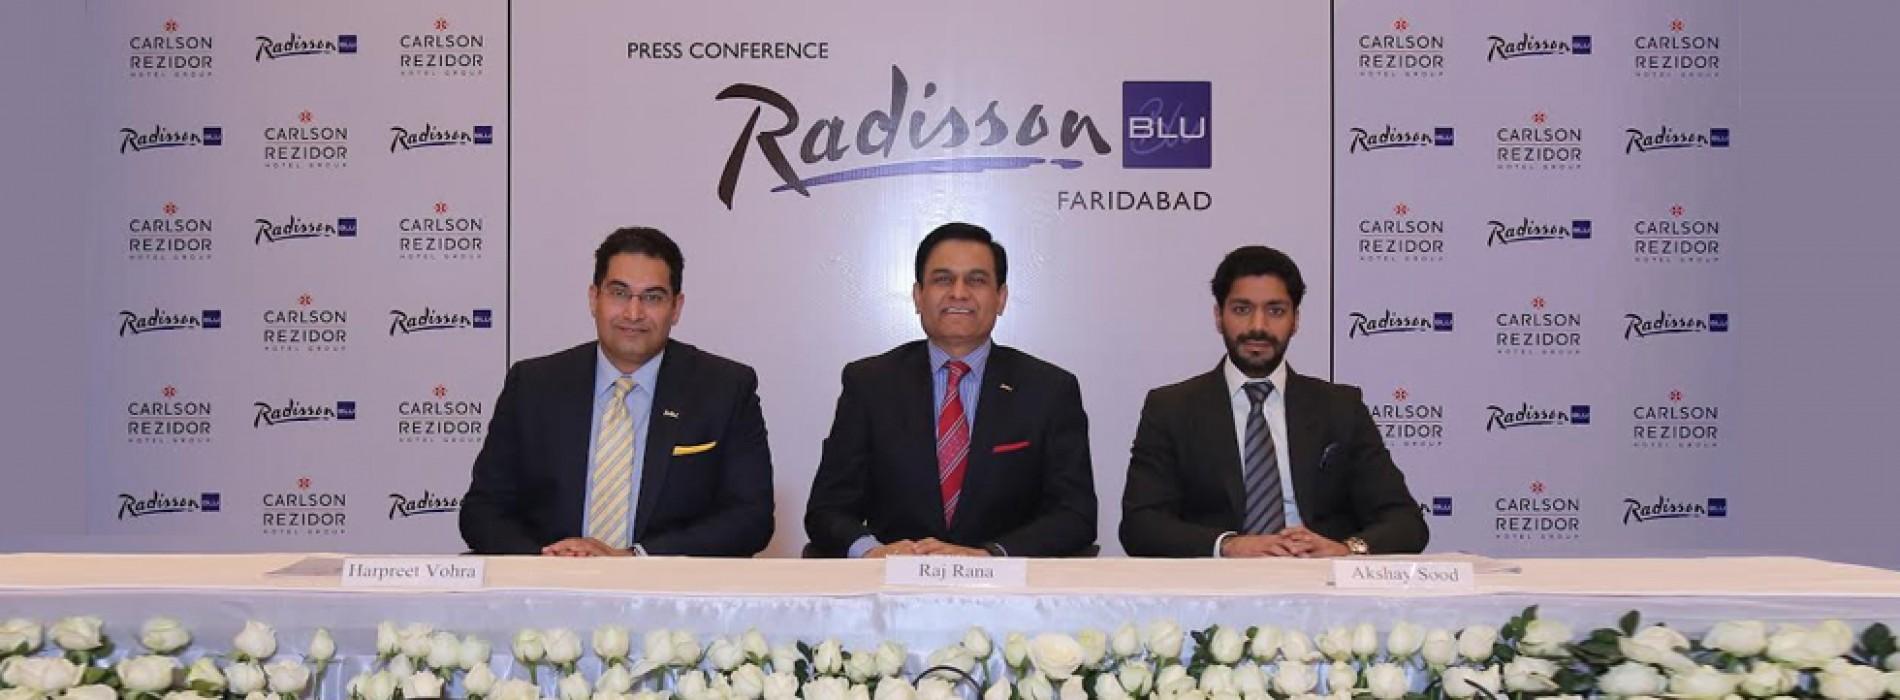 Radisson Blu Hotel Faridabad – The City's First International Upper Upscale Hotel opens